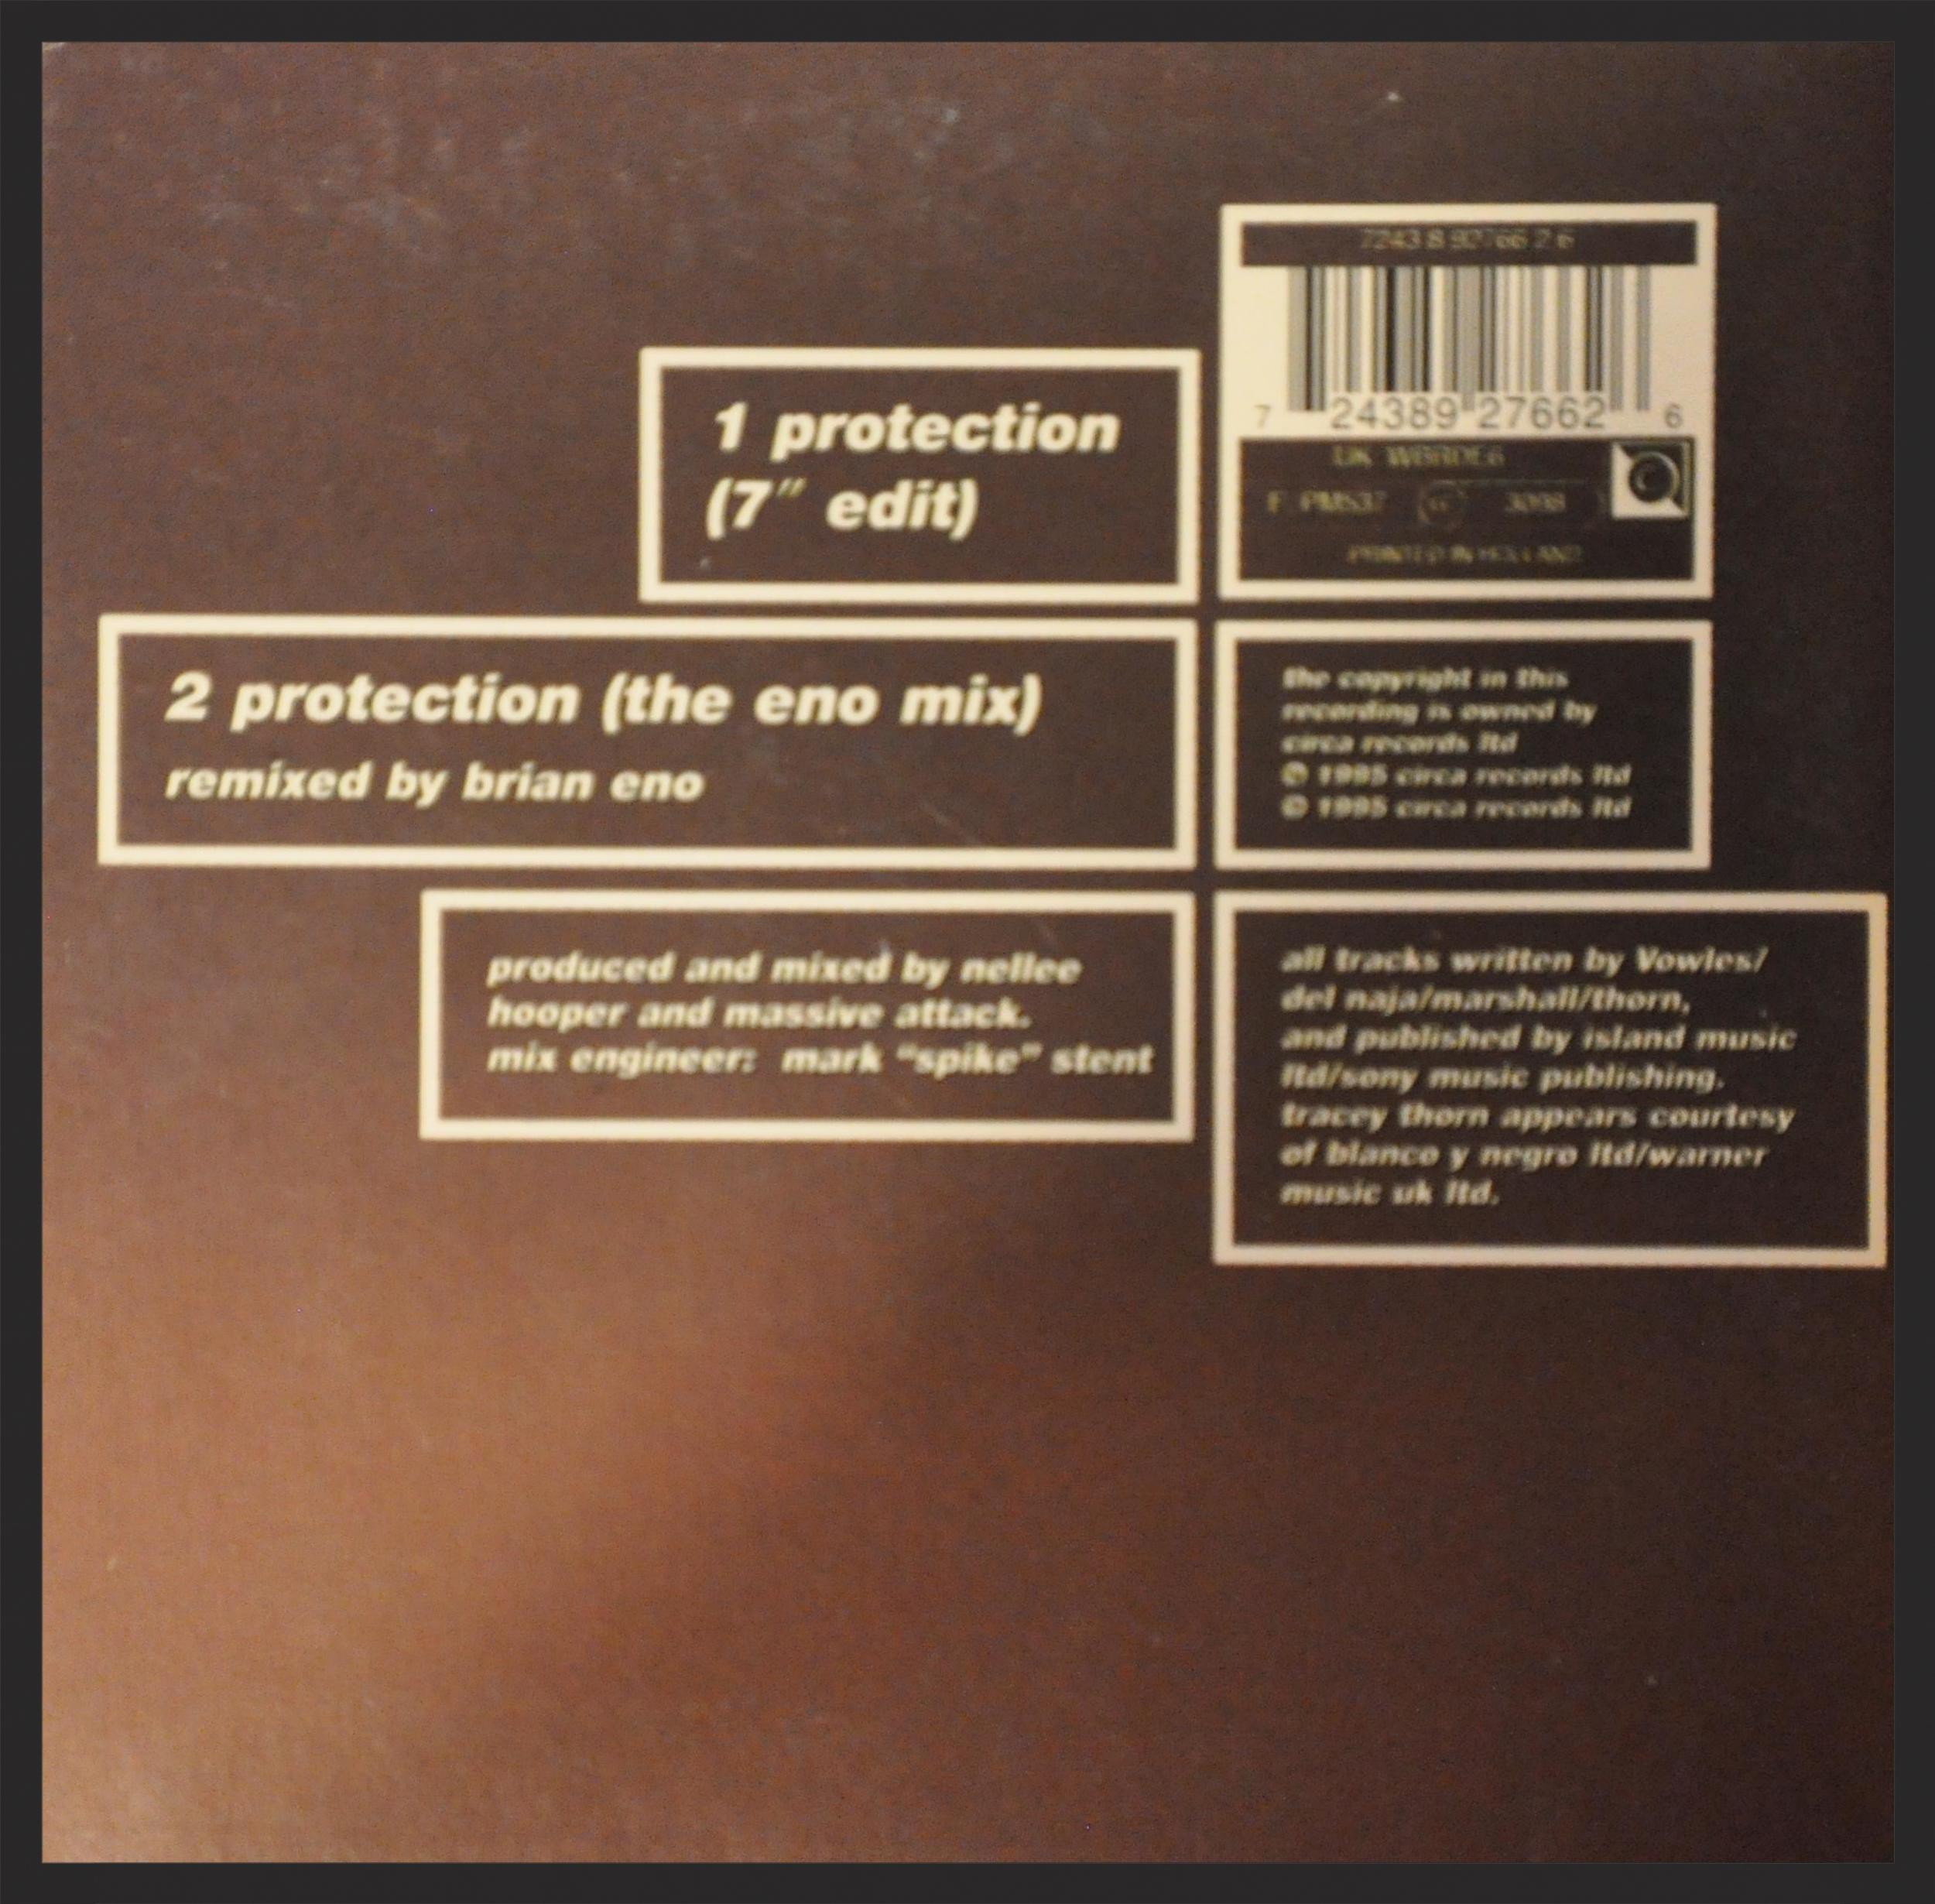 protectioneuroreissue2.jpg